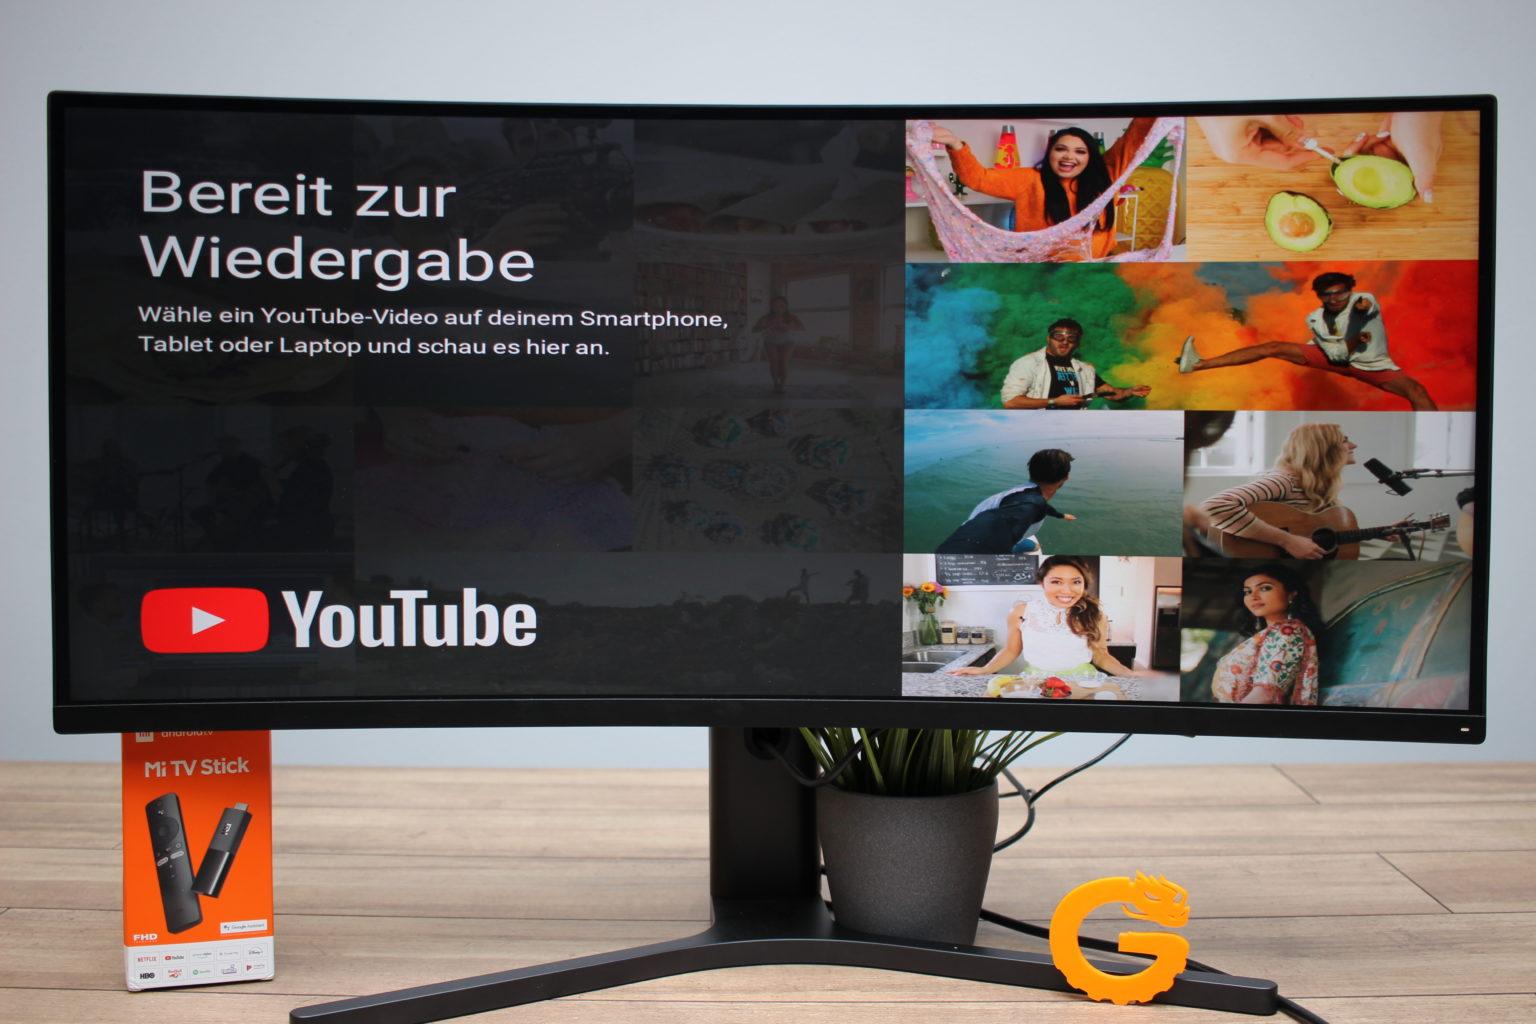 Youtube en Chromecast con el Xiaomi Mi TV Stick